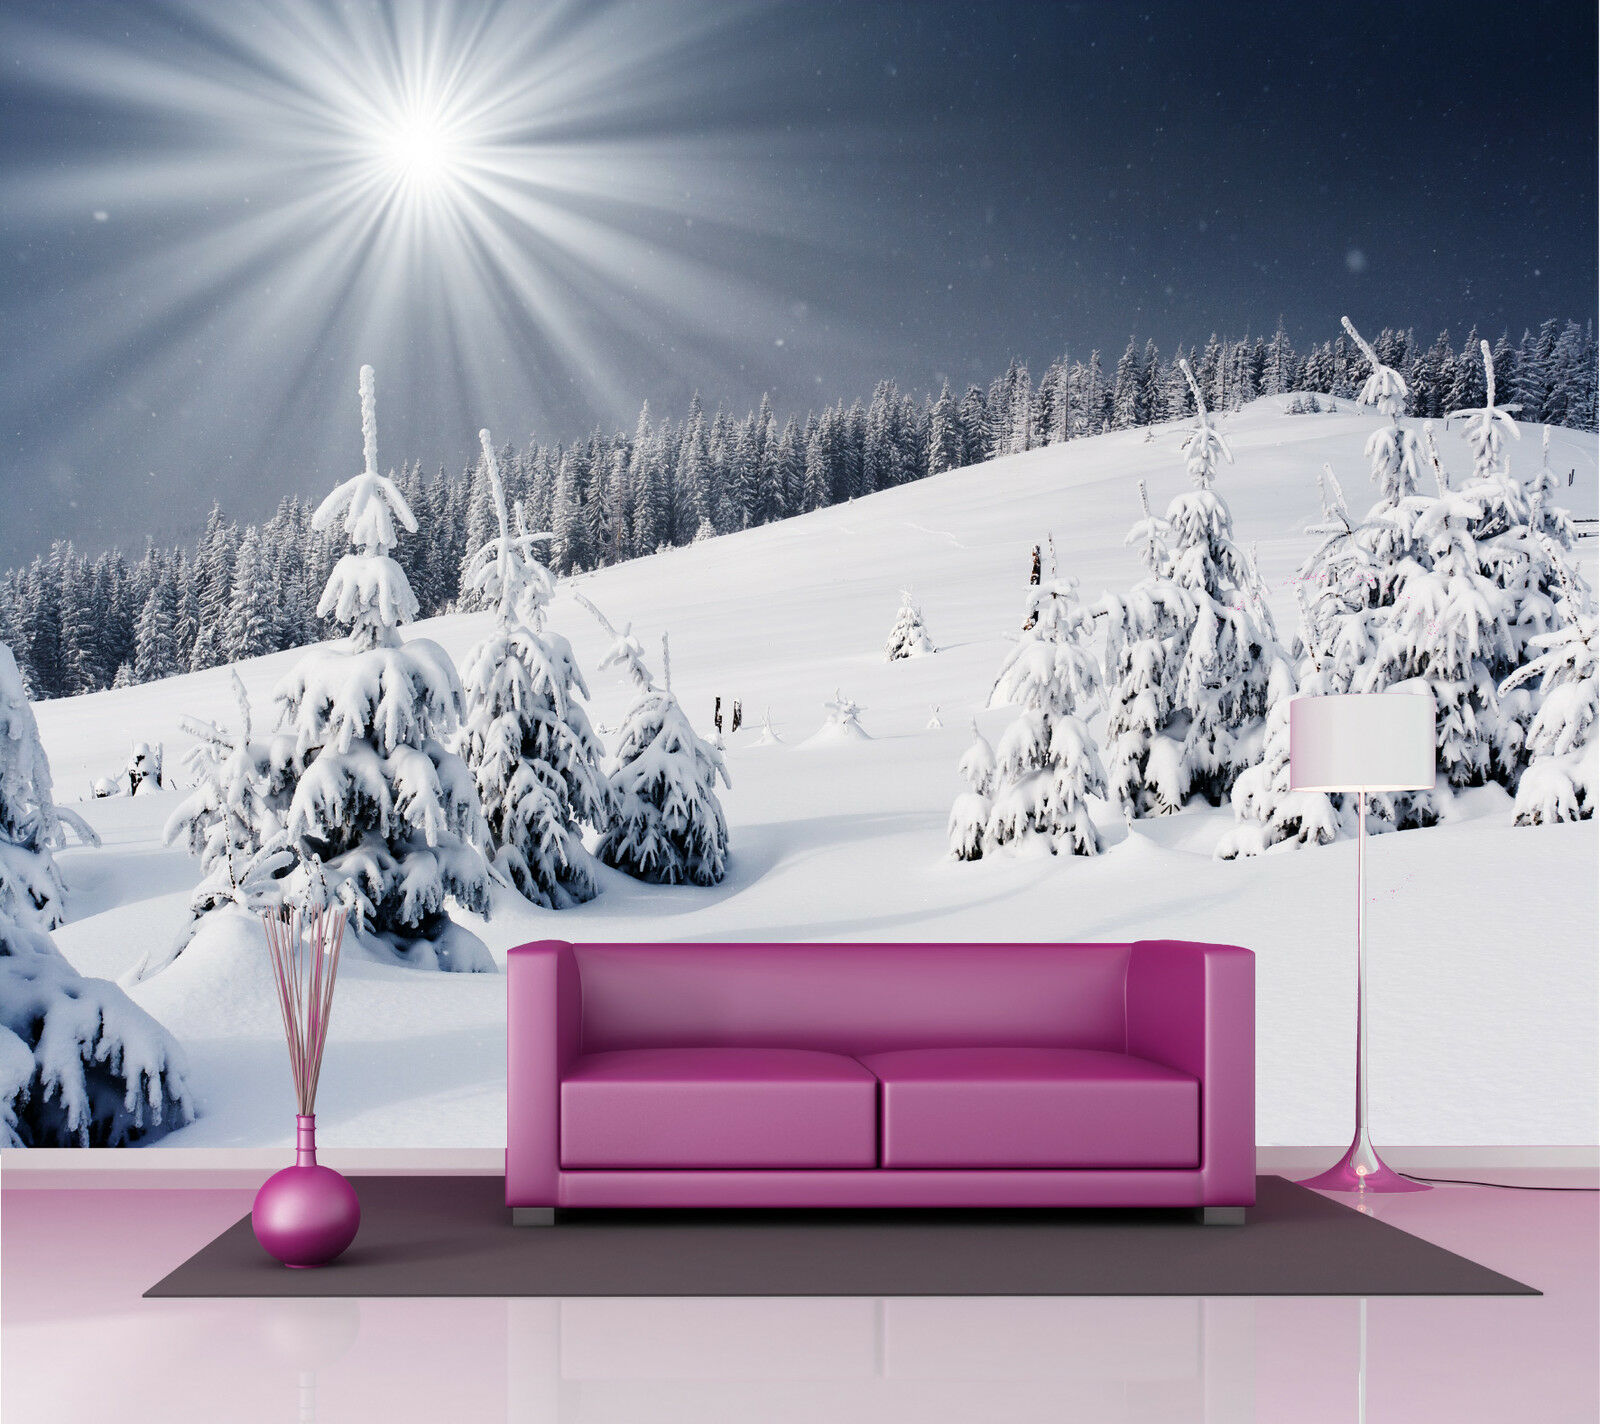 Adesivo Parete Gigante Montagna Winter 260x360cm P128